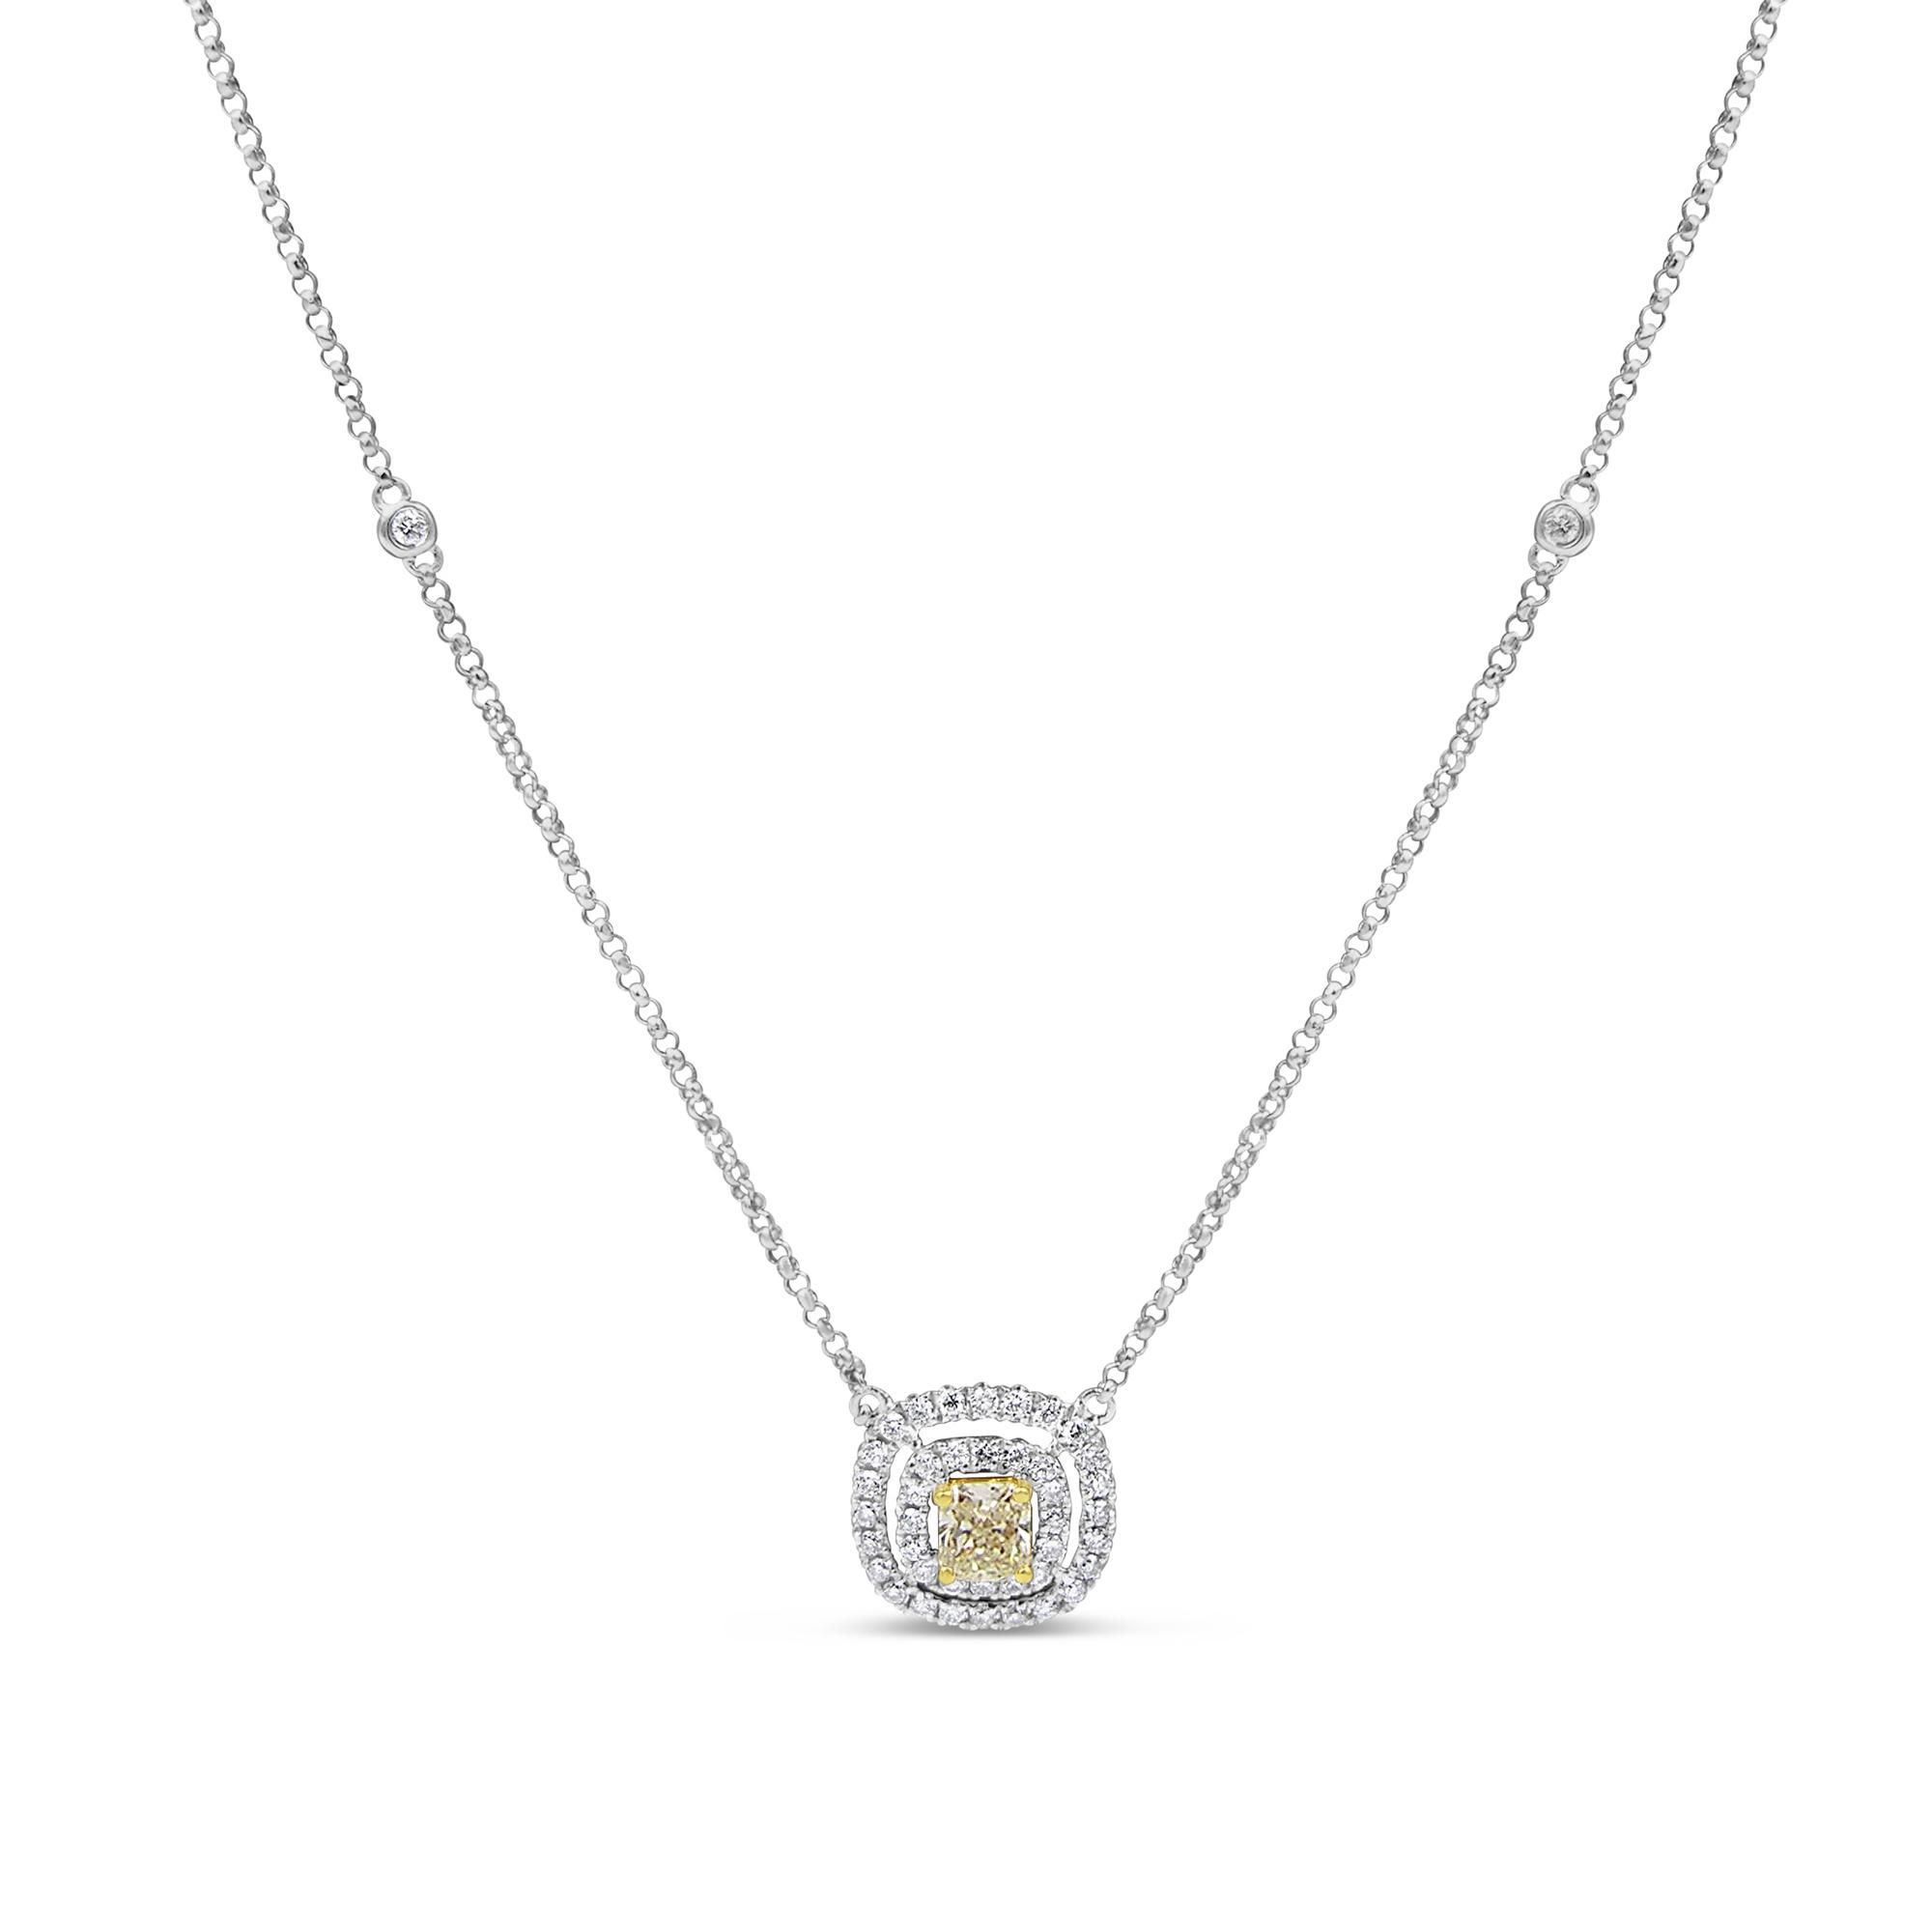 18 karat white gold chain with 0.67 ct diamonds pendant